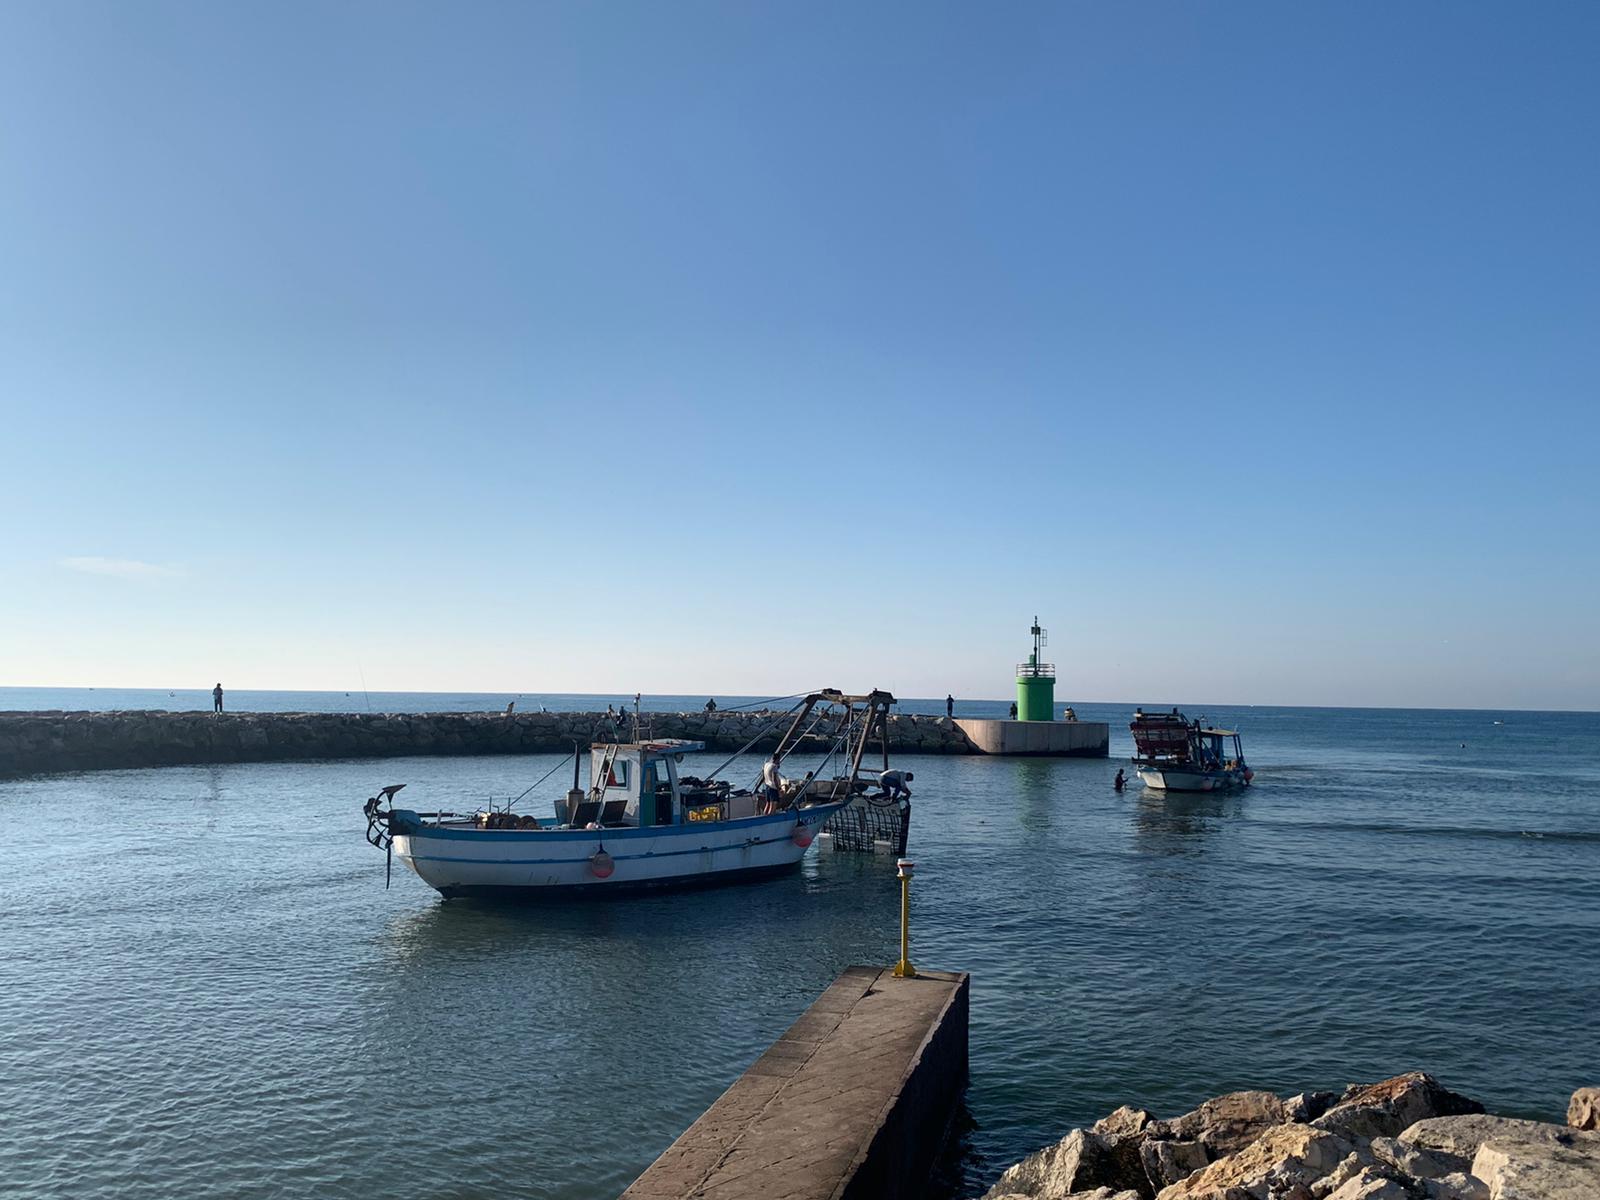 Barca arenata a Rio Martino